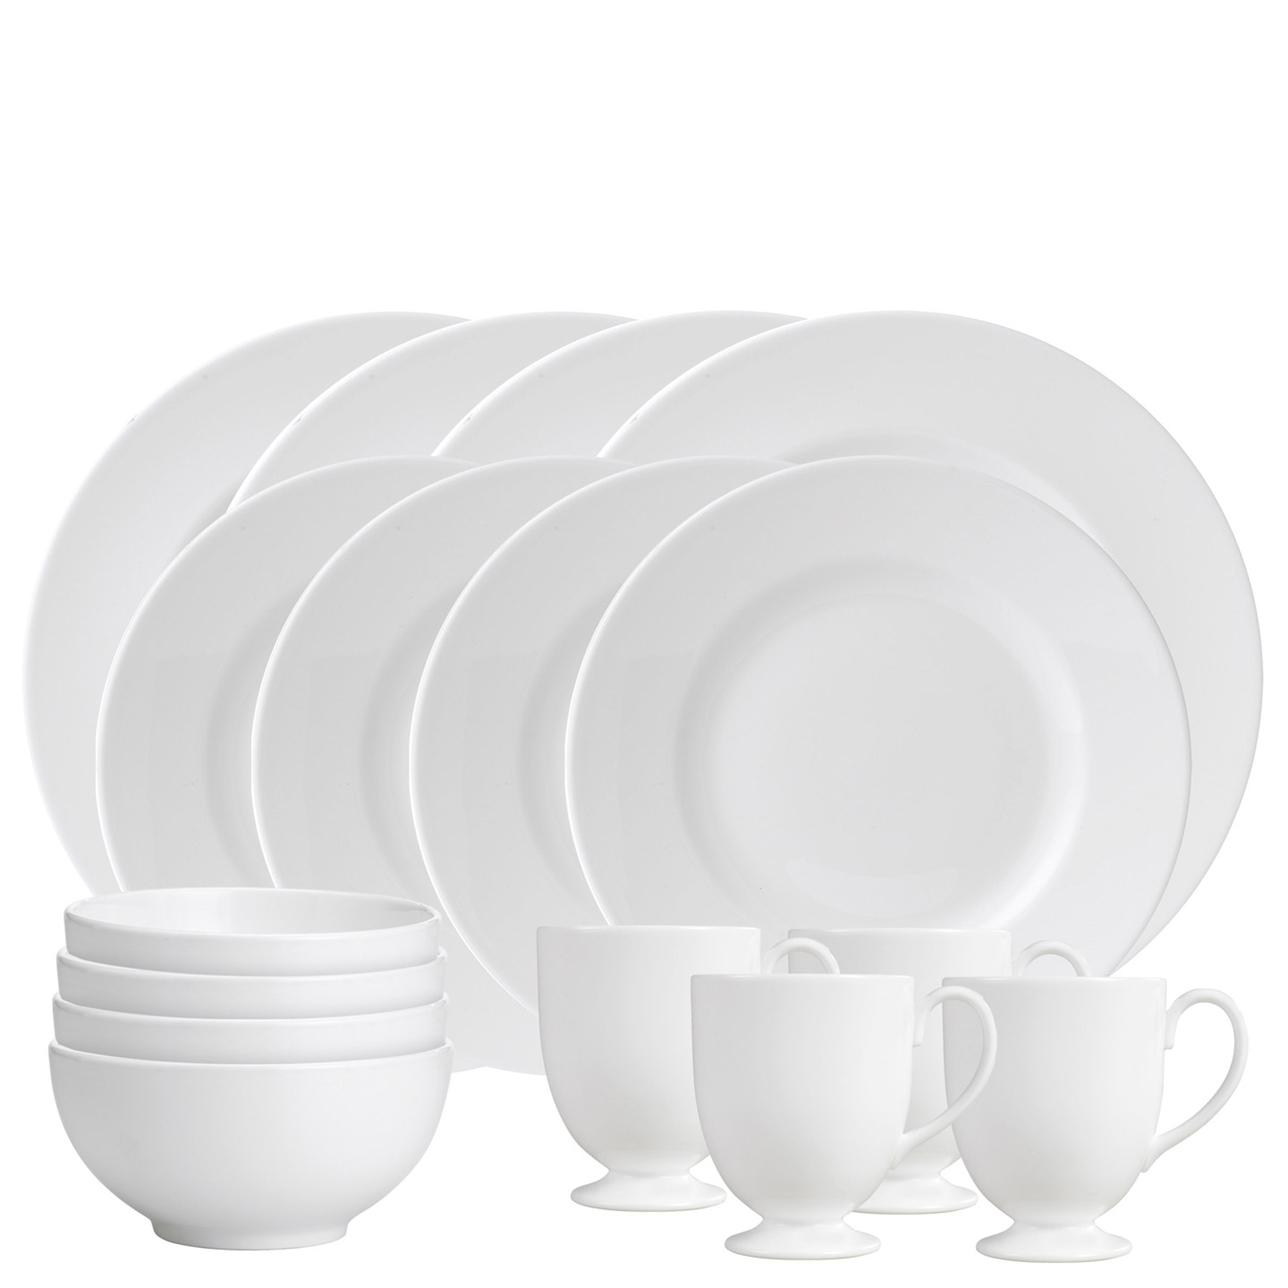 Wedgwood White 16 Piece Dinner Set